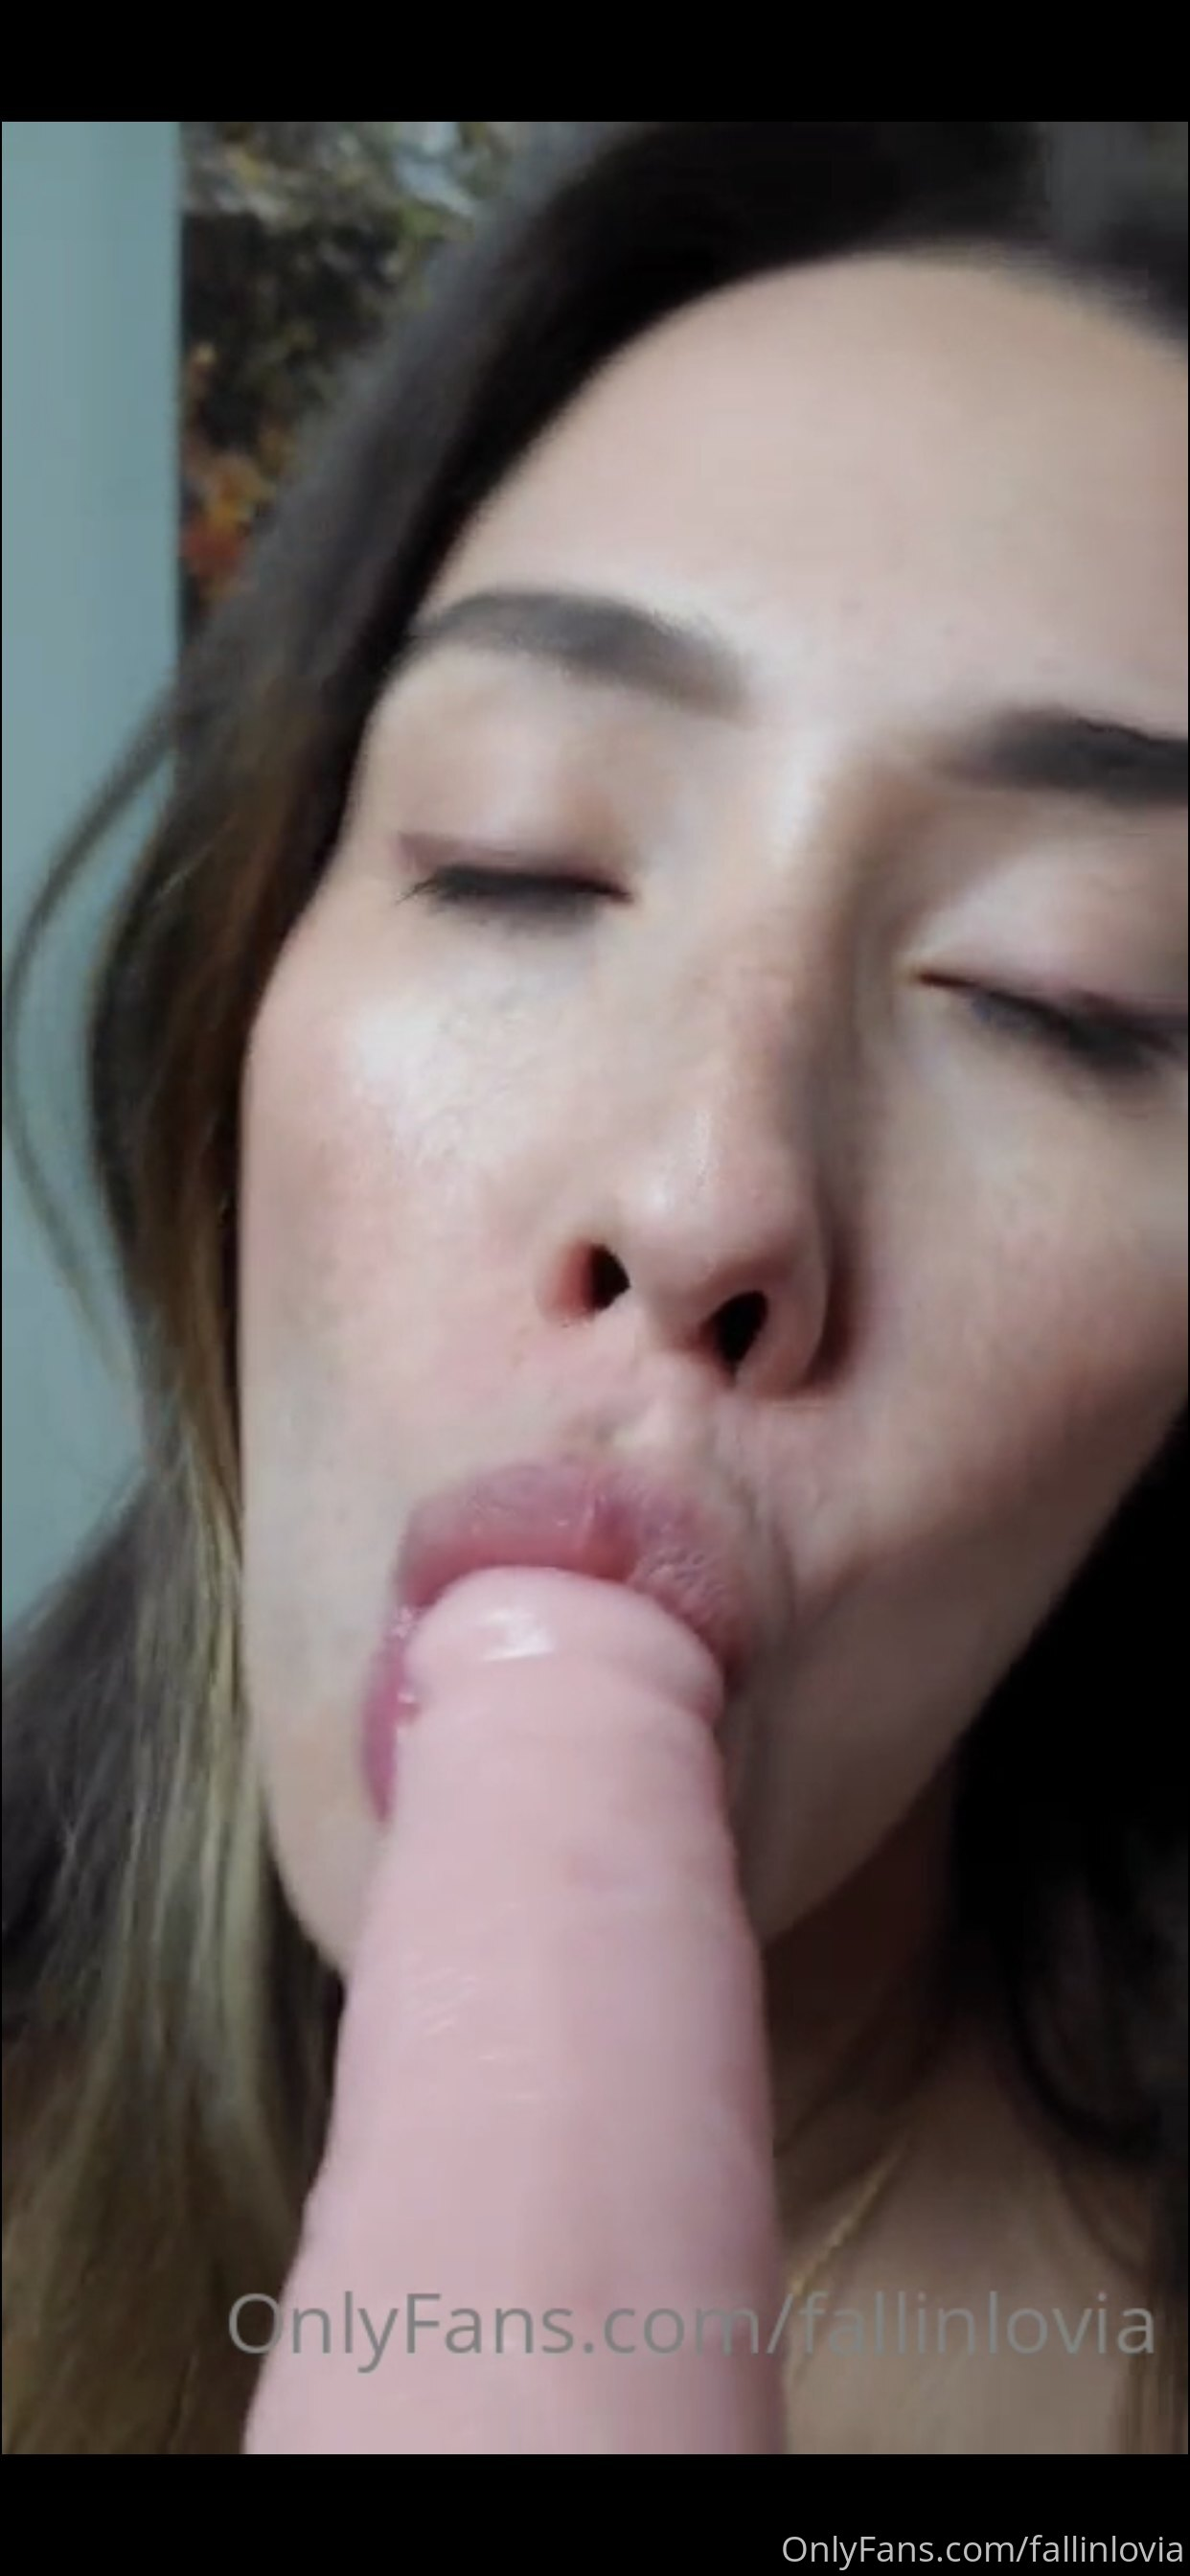 Eva Lovia, Fallinlovia, Onlyfans 0044